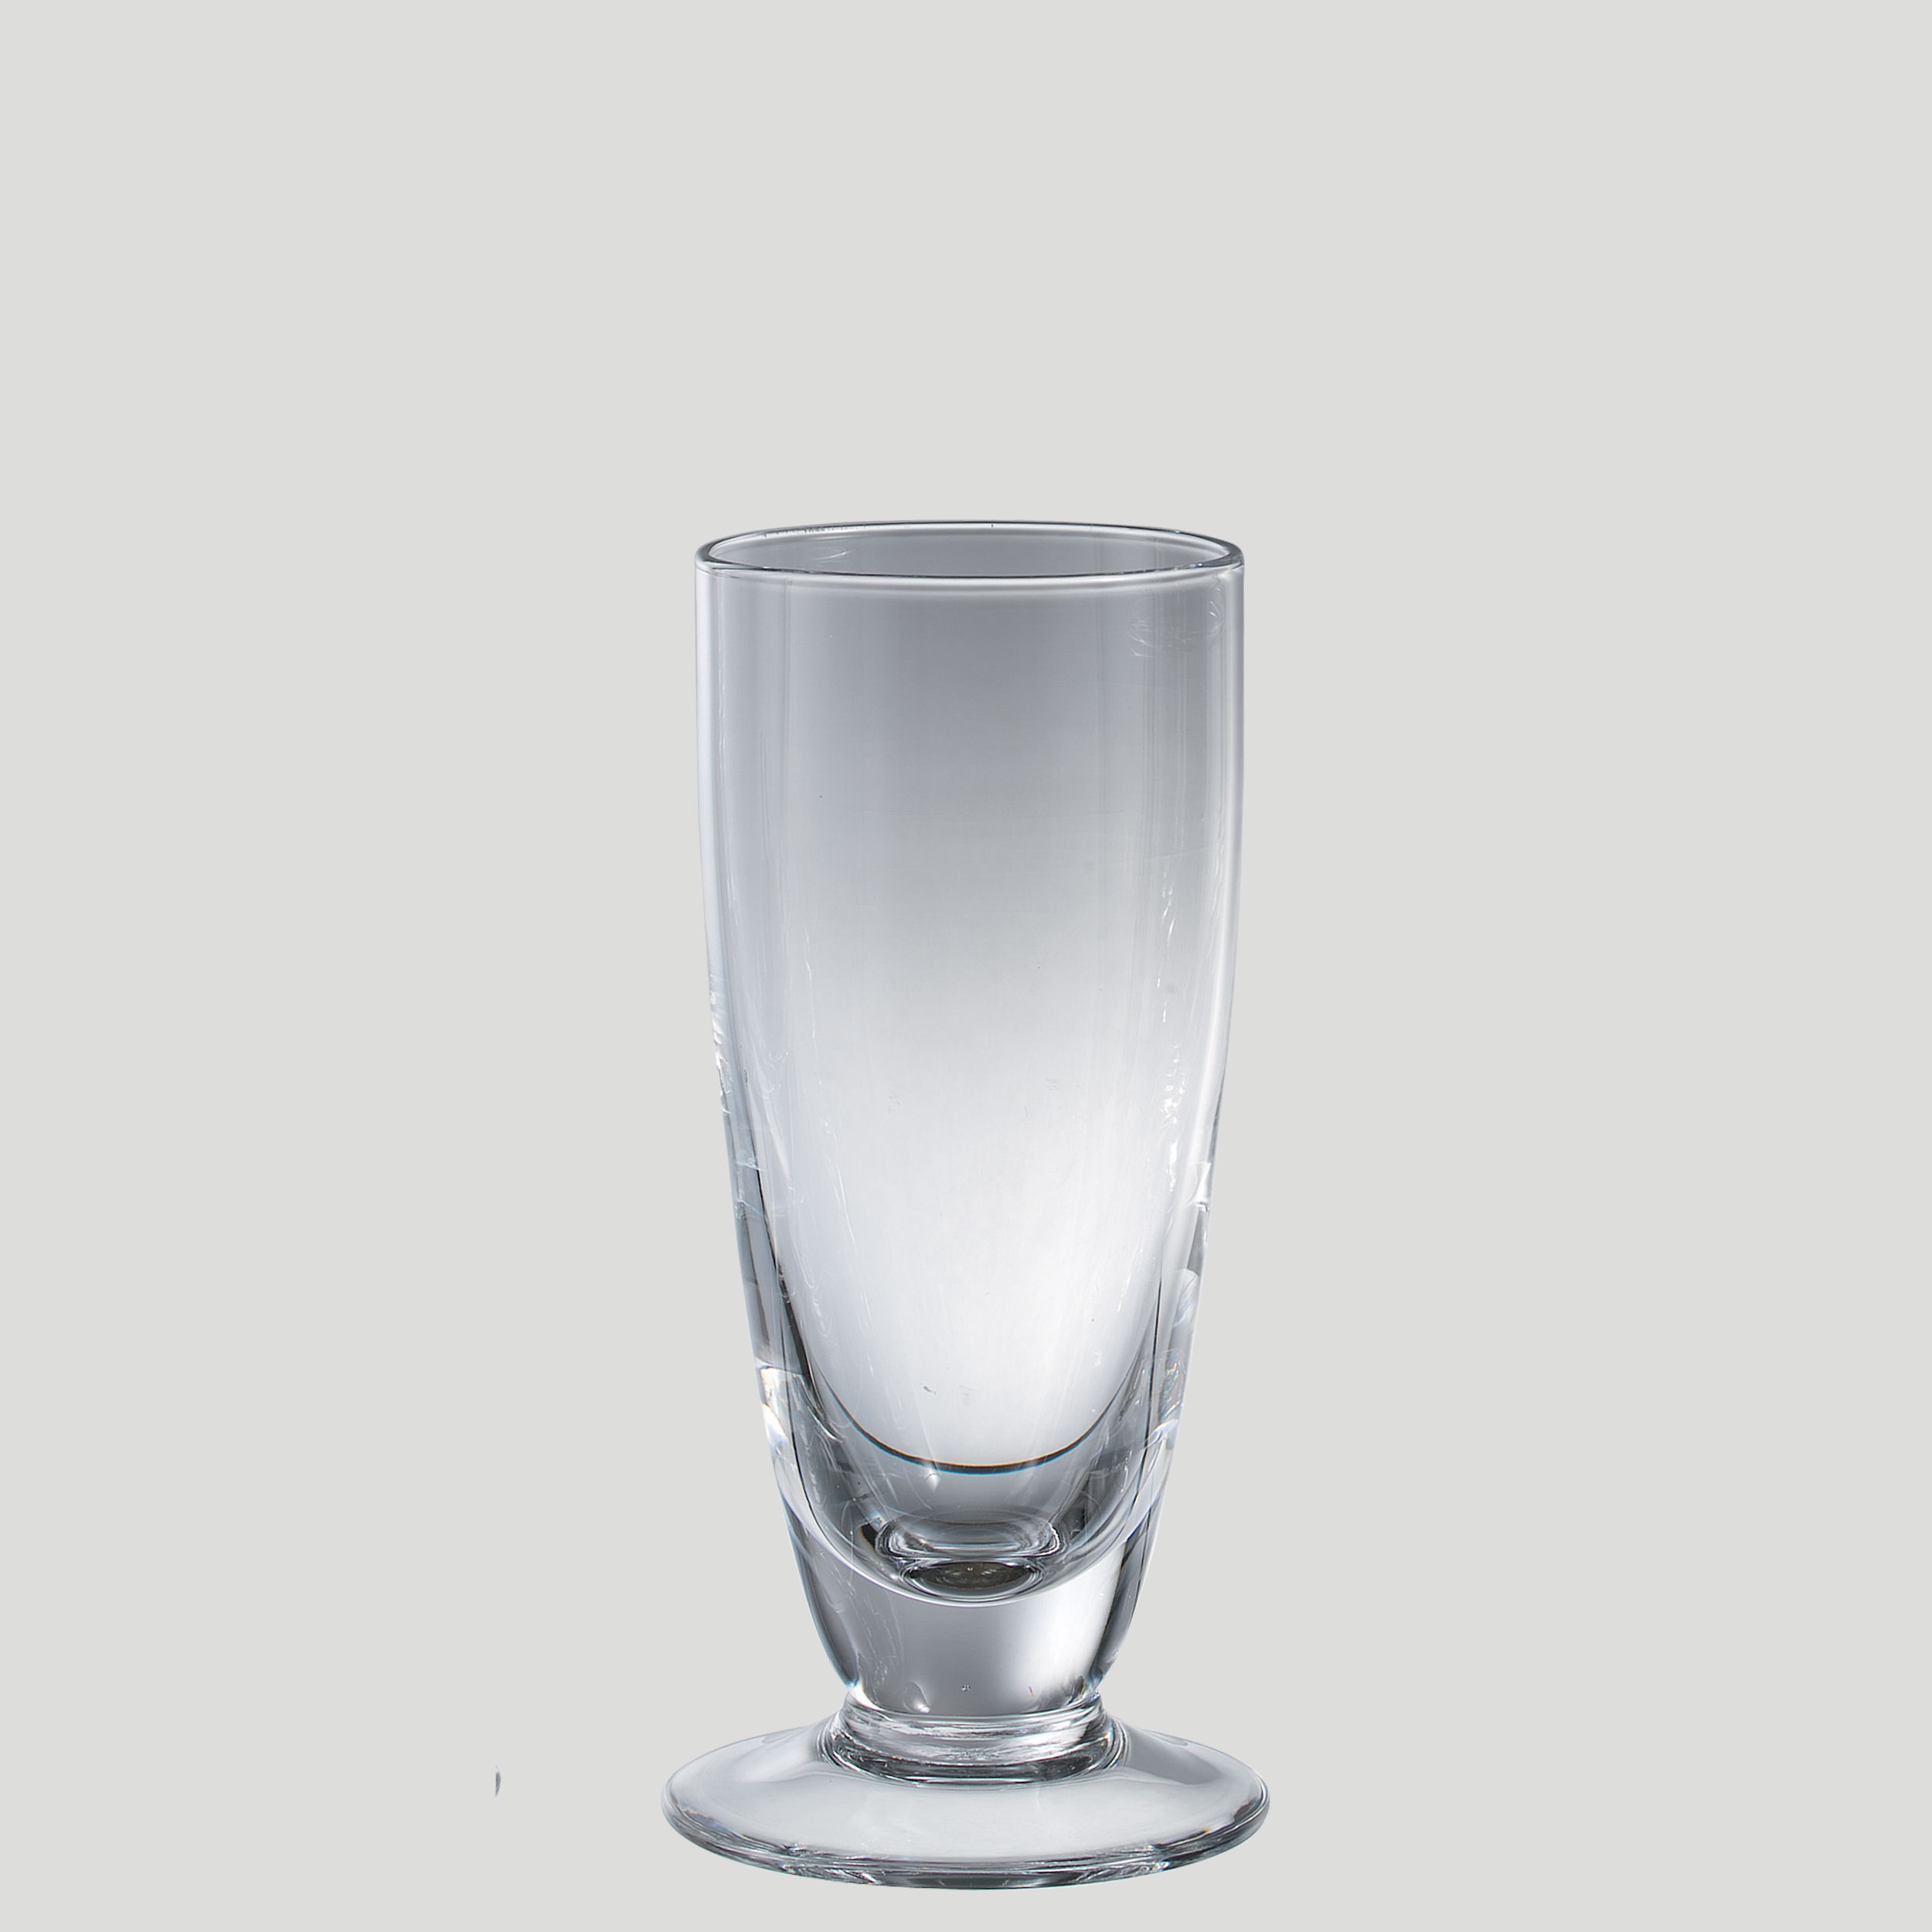 Pinguino - Coppa per gelato in vetro - Gardagel